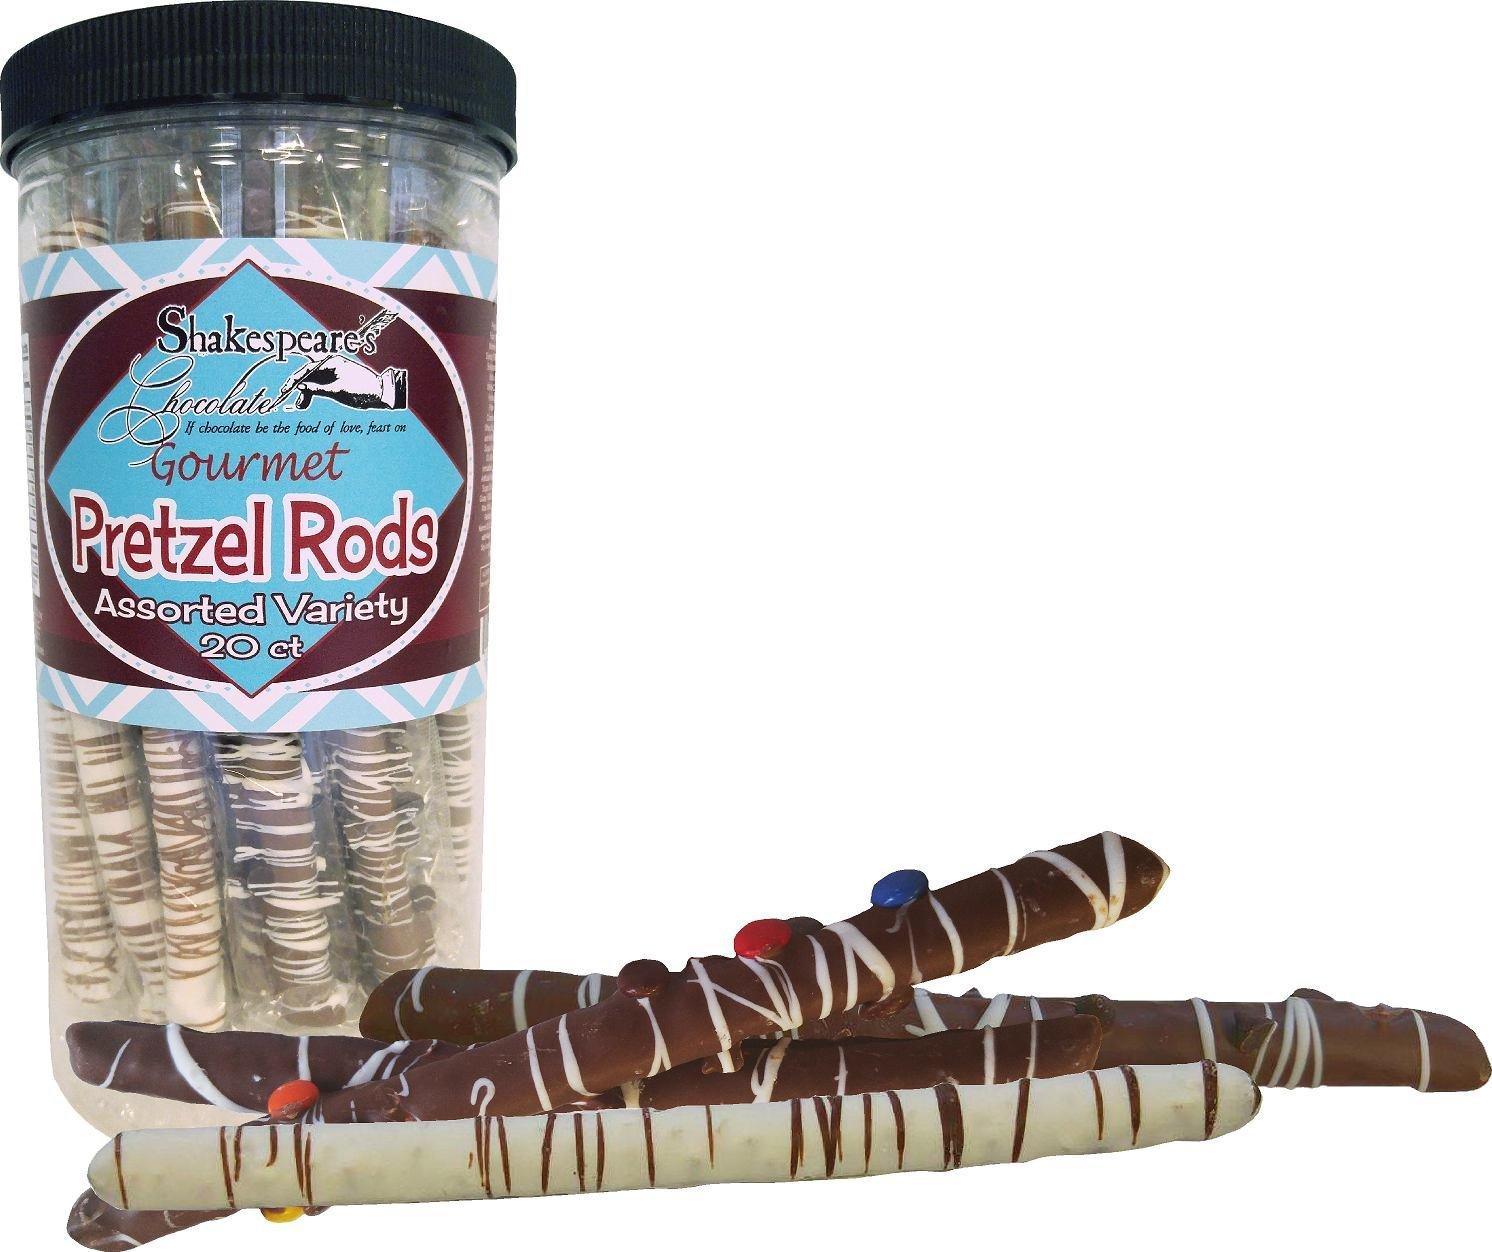 Amazon.com: Shakespeare\'s Chocolate Assorted Pretzel Rods - 20 count